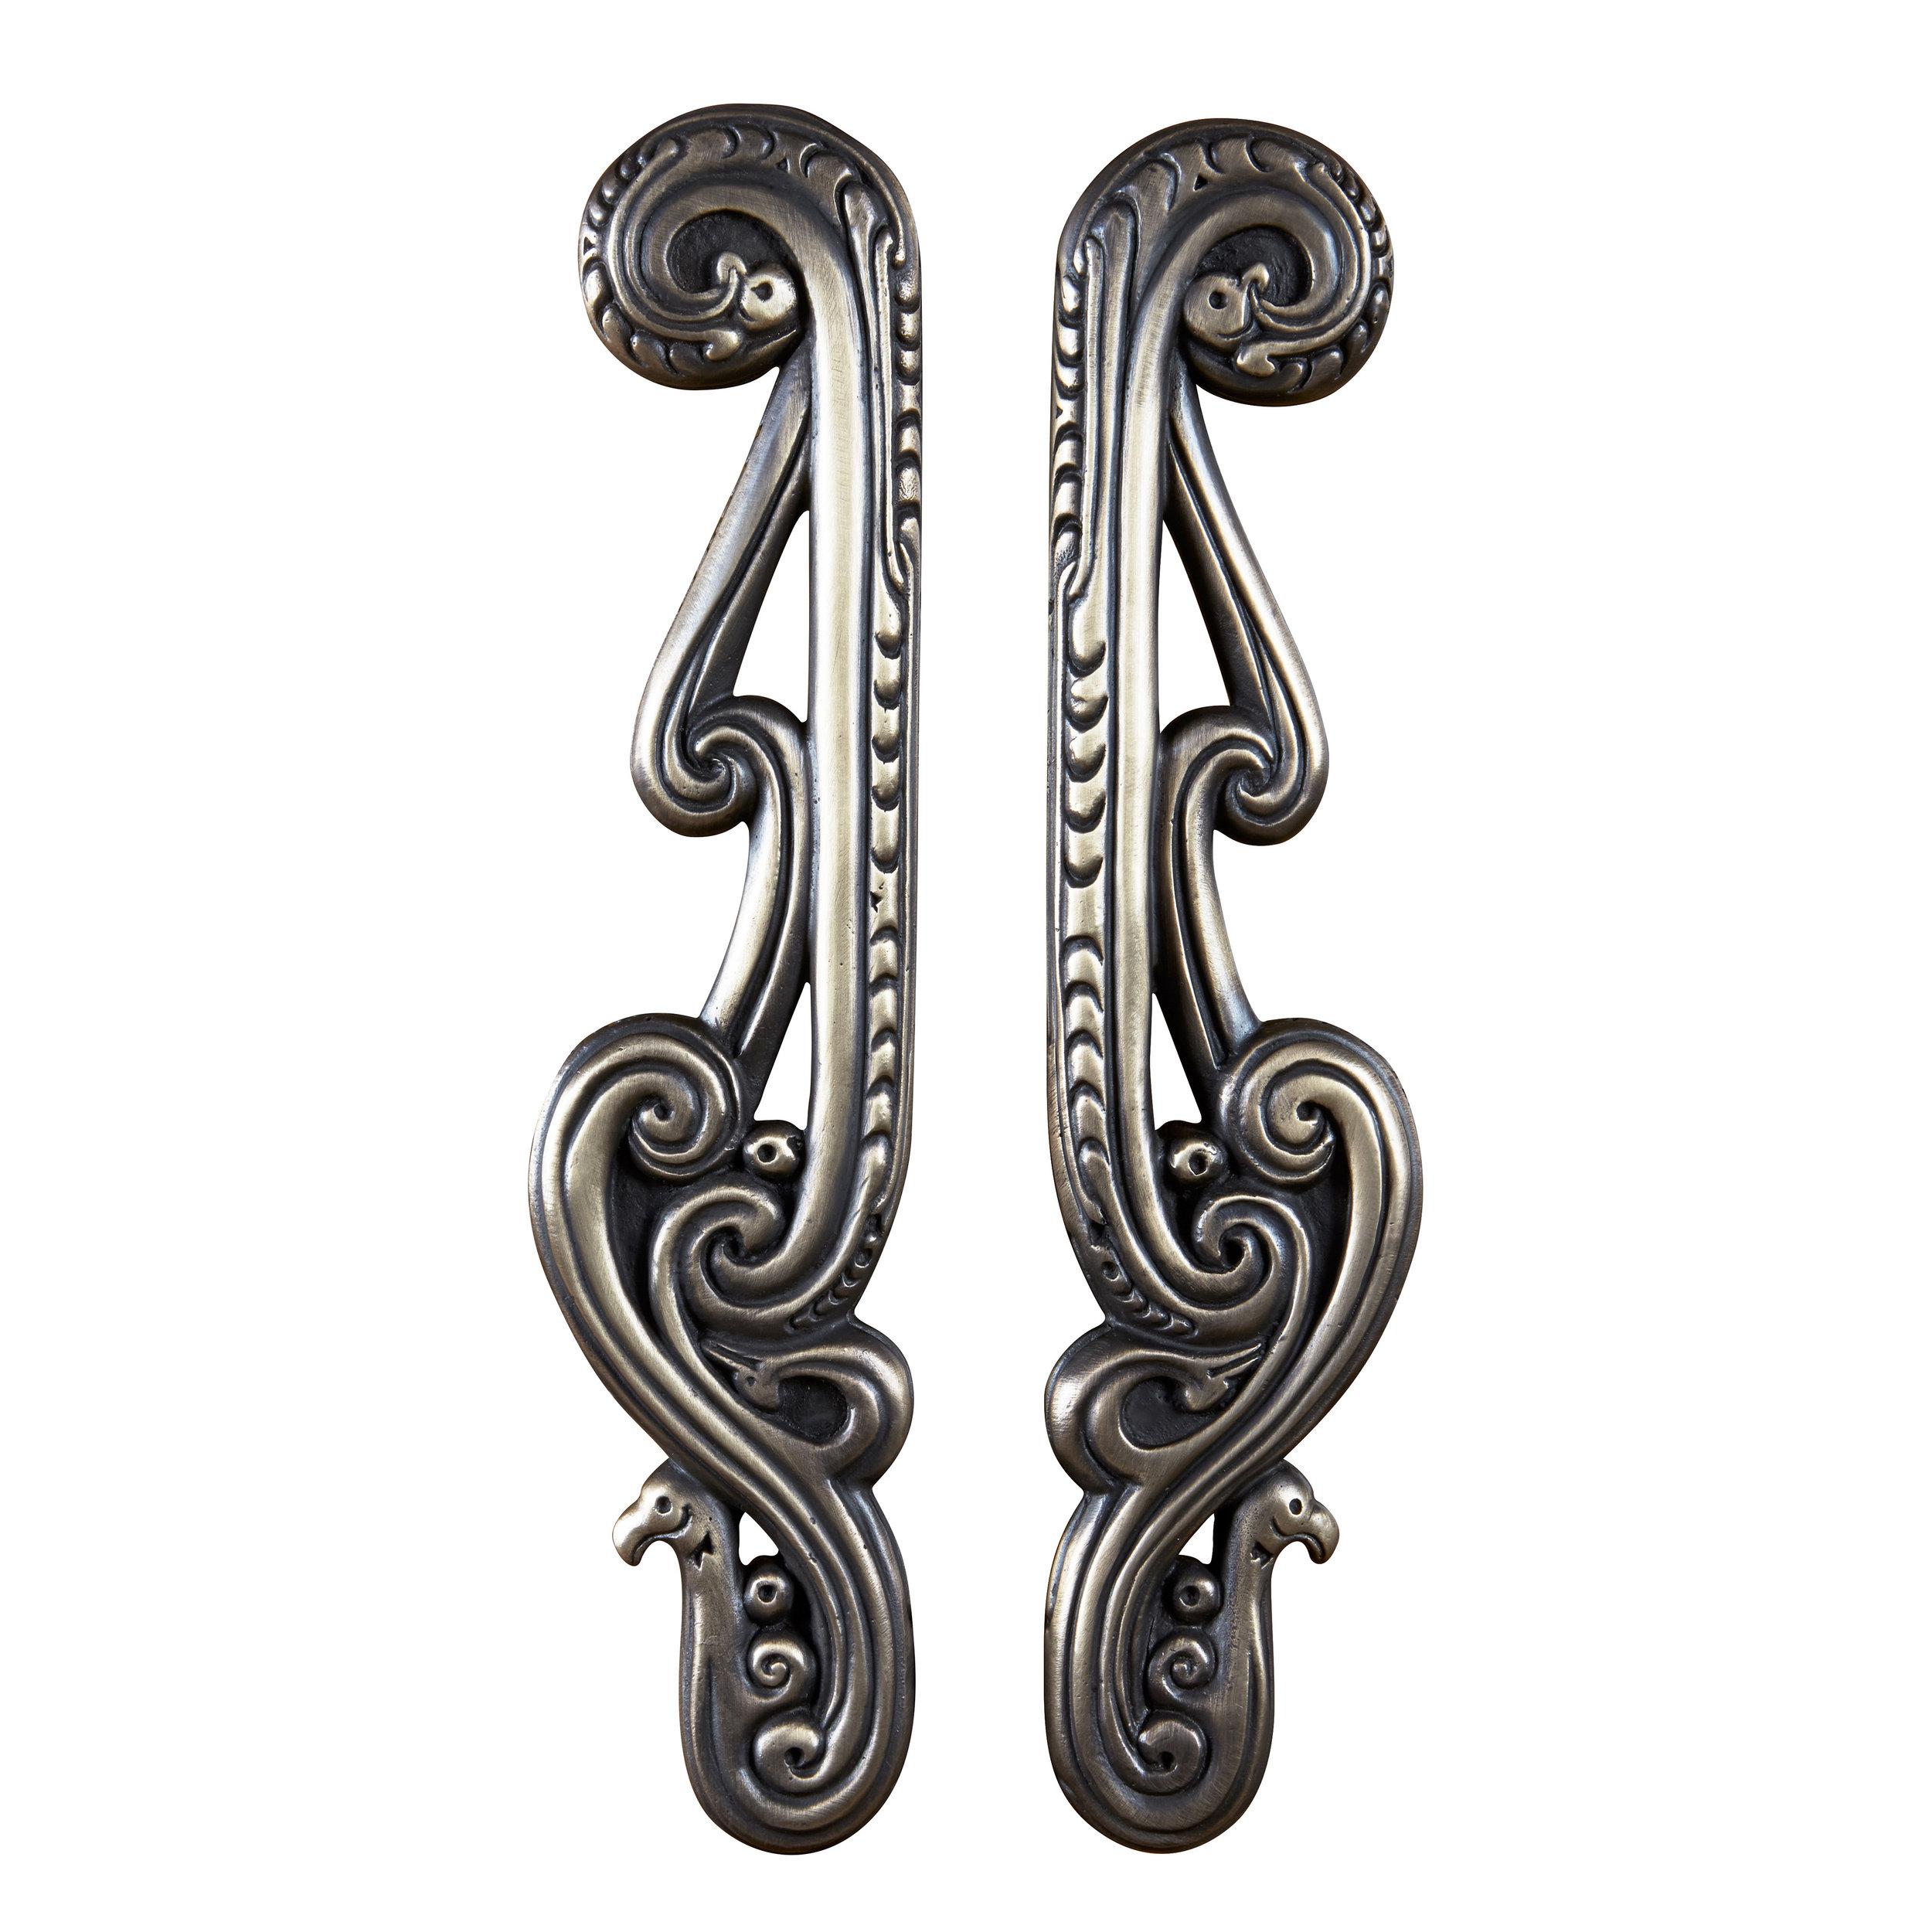 Dragonfly cabinet knob